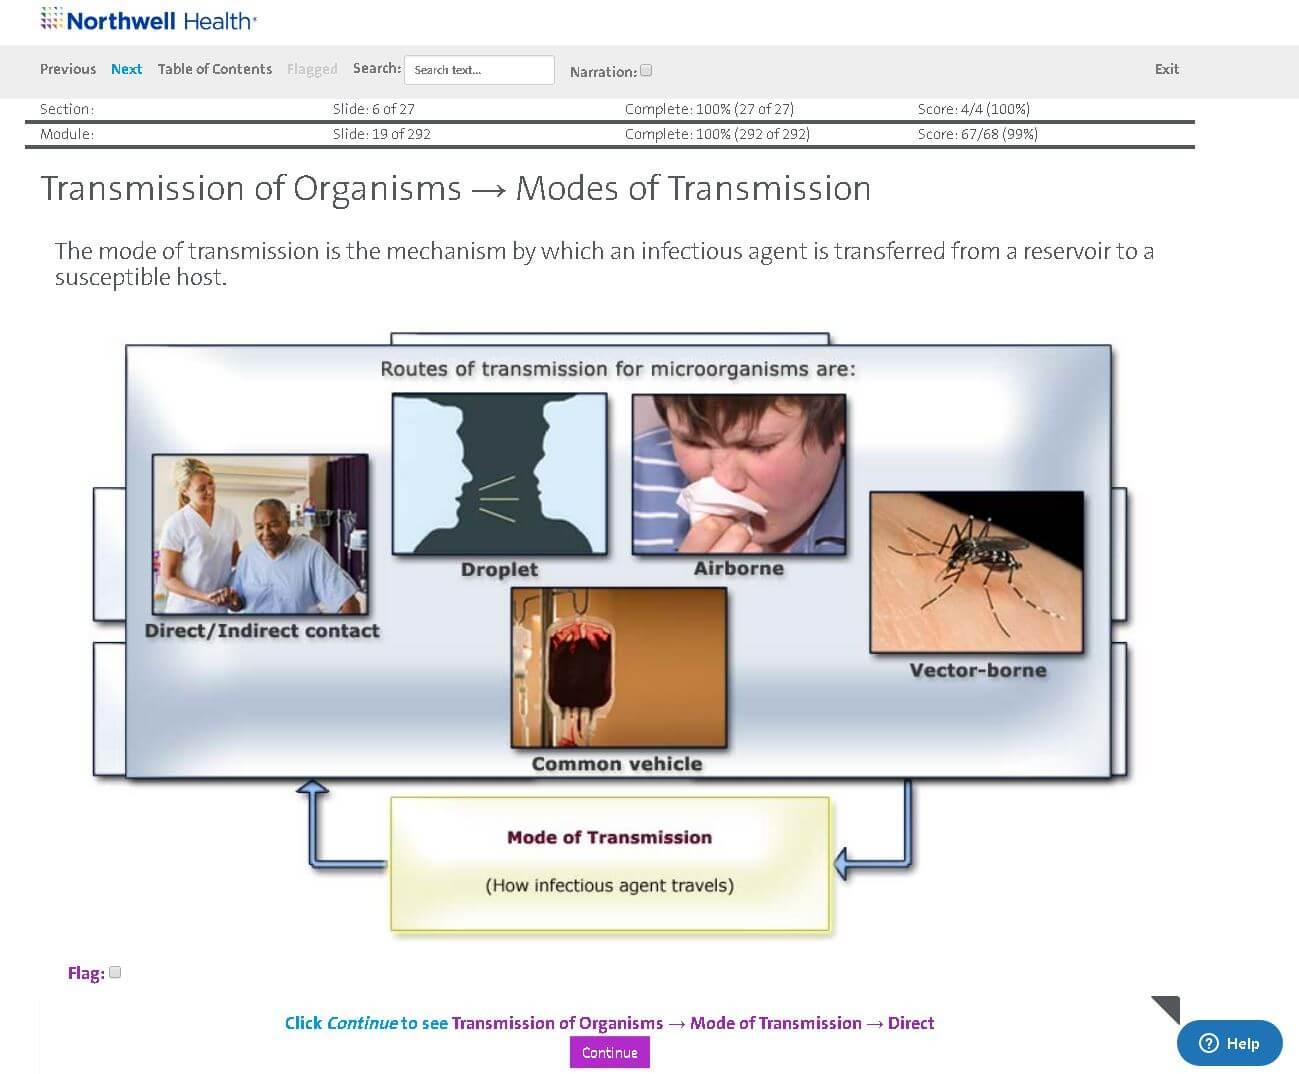 Online Testing/Training Software | DxR CORE - DxR